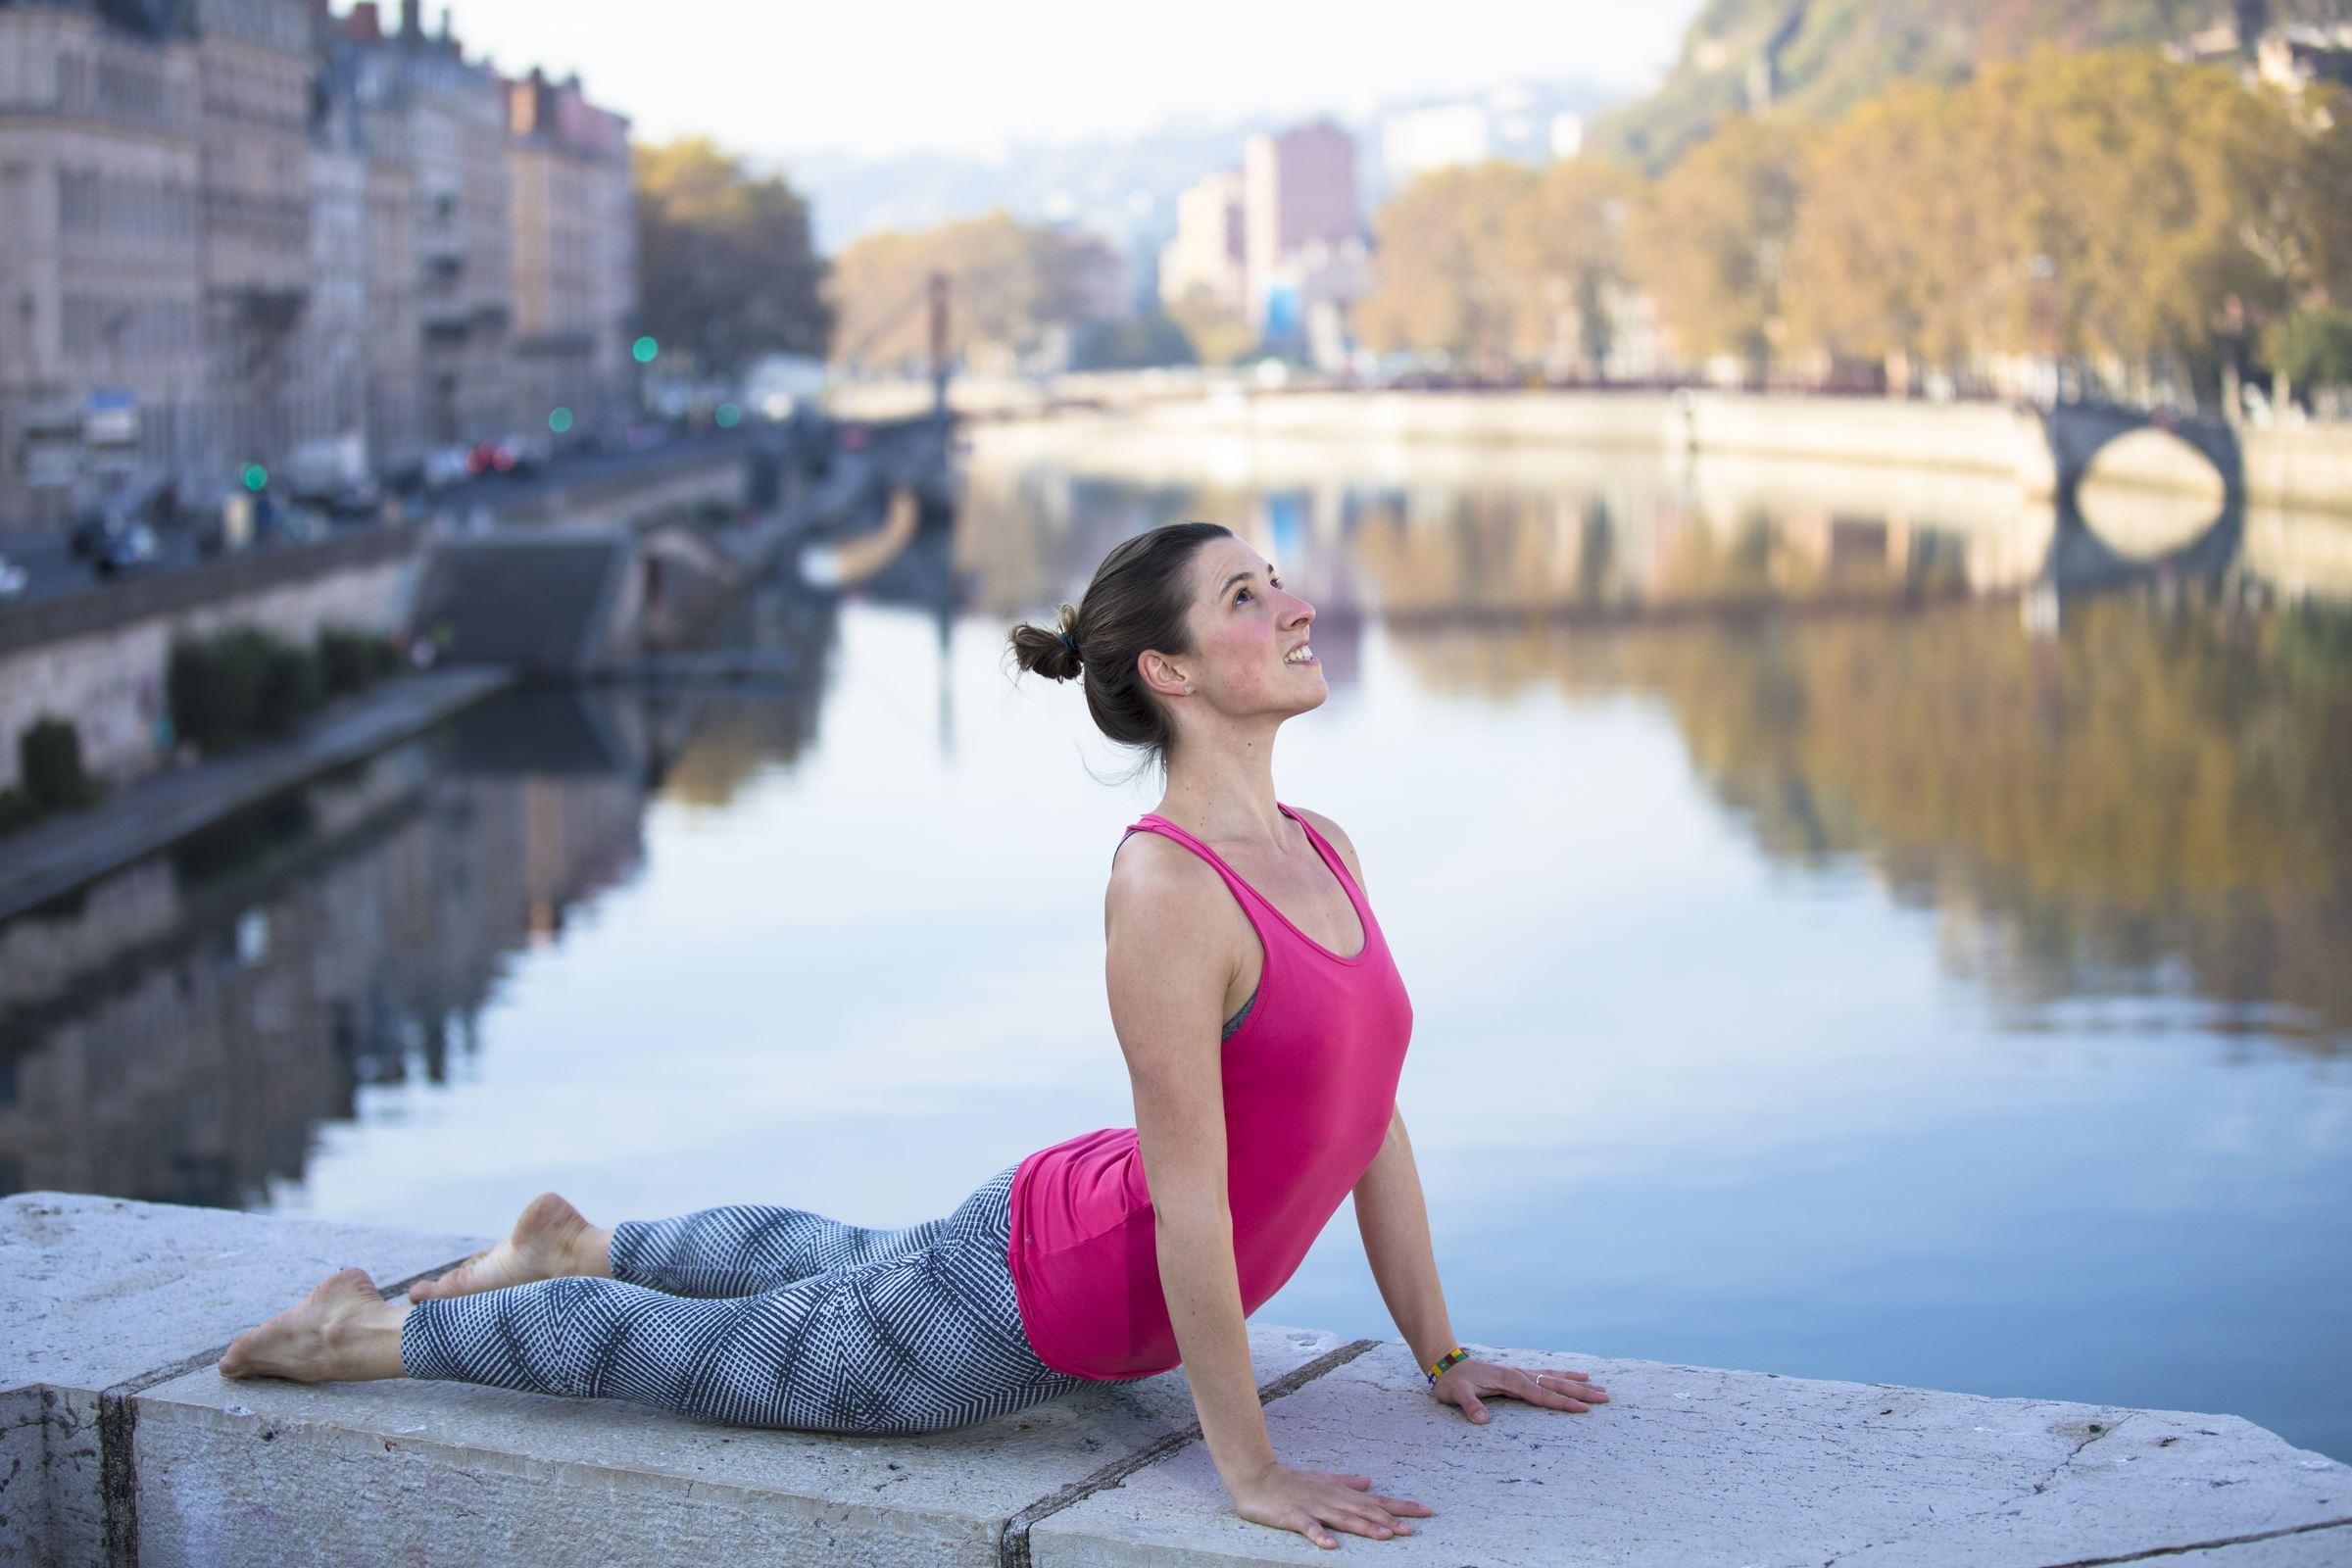 Elad Itzkin Yoga Photography - Margot Flandrin - 7420